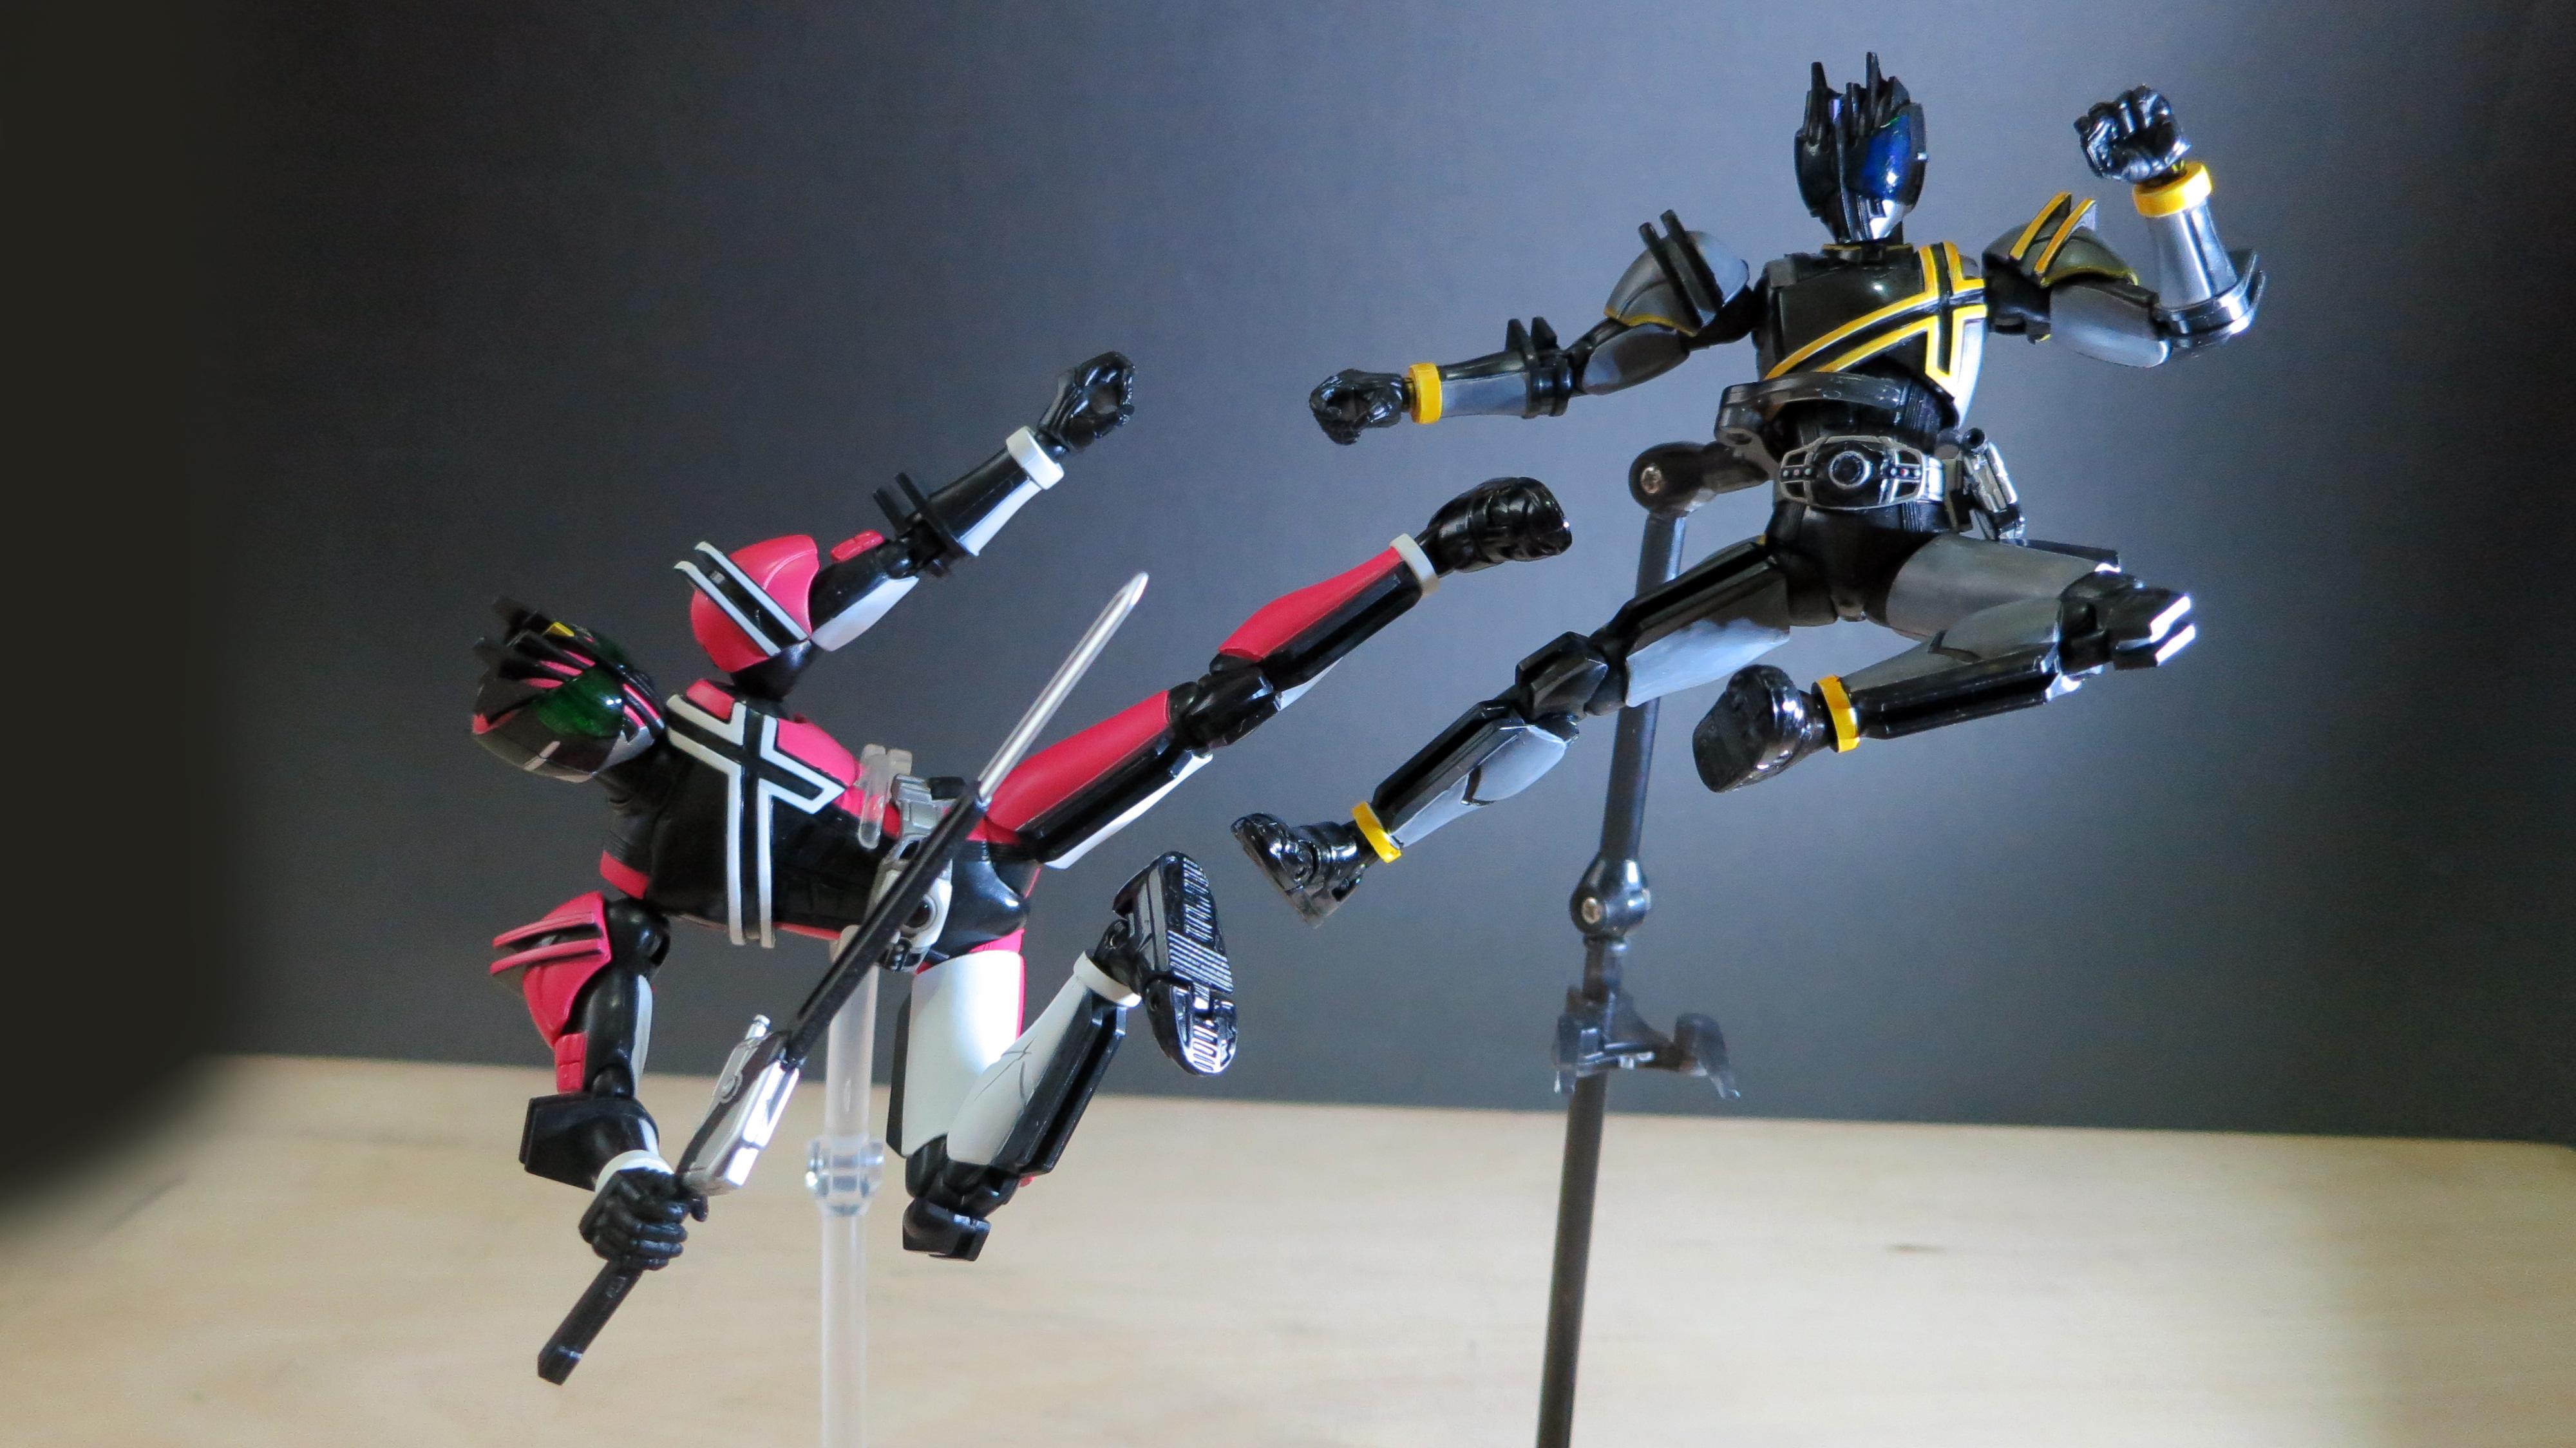 S.H. Figuarts Kamen Rider Dark Decade Vs Decade by ...